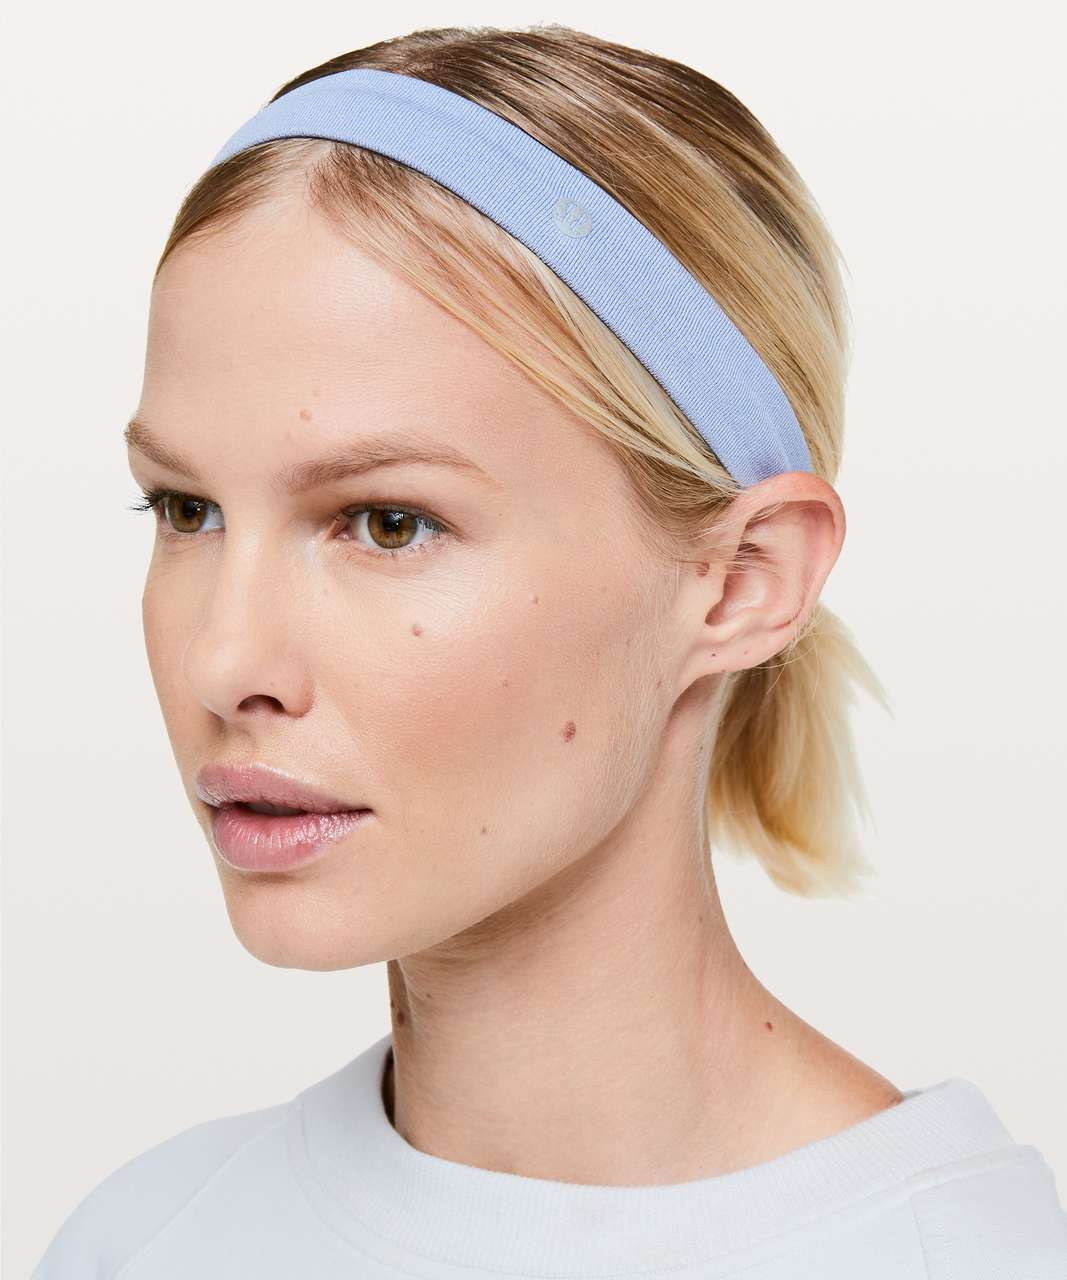 Lululemon Cardio Cross Trainer Headband - Iron Purple / White